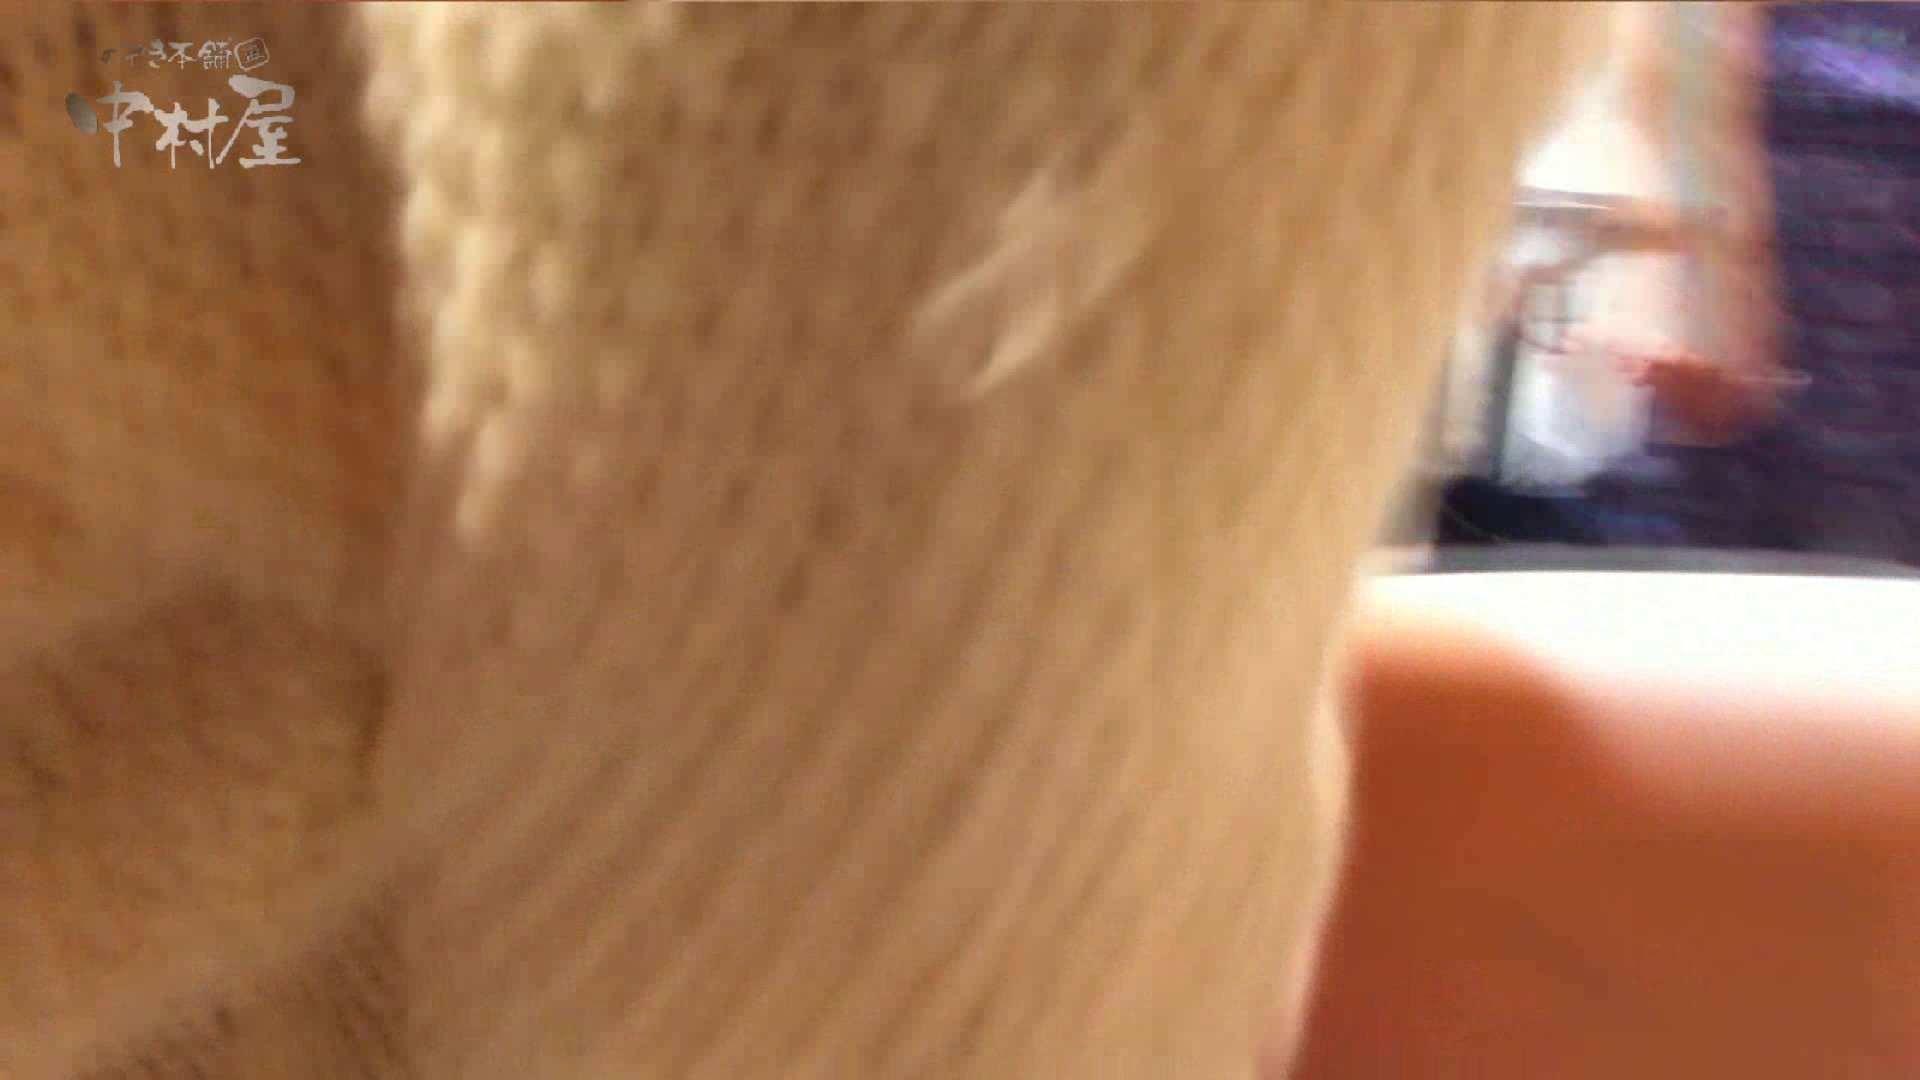 vol.73 美人アパレル胸チラ&パンチラ 目の下のホクロがエッチな店員さん 接写 ワレメ動画紹介 66連発 41